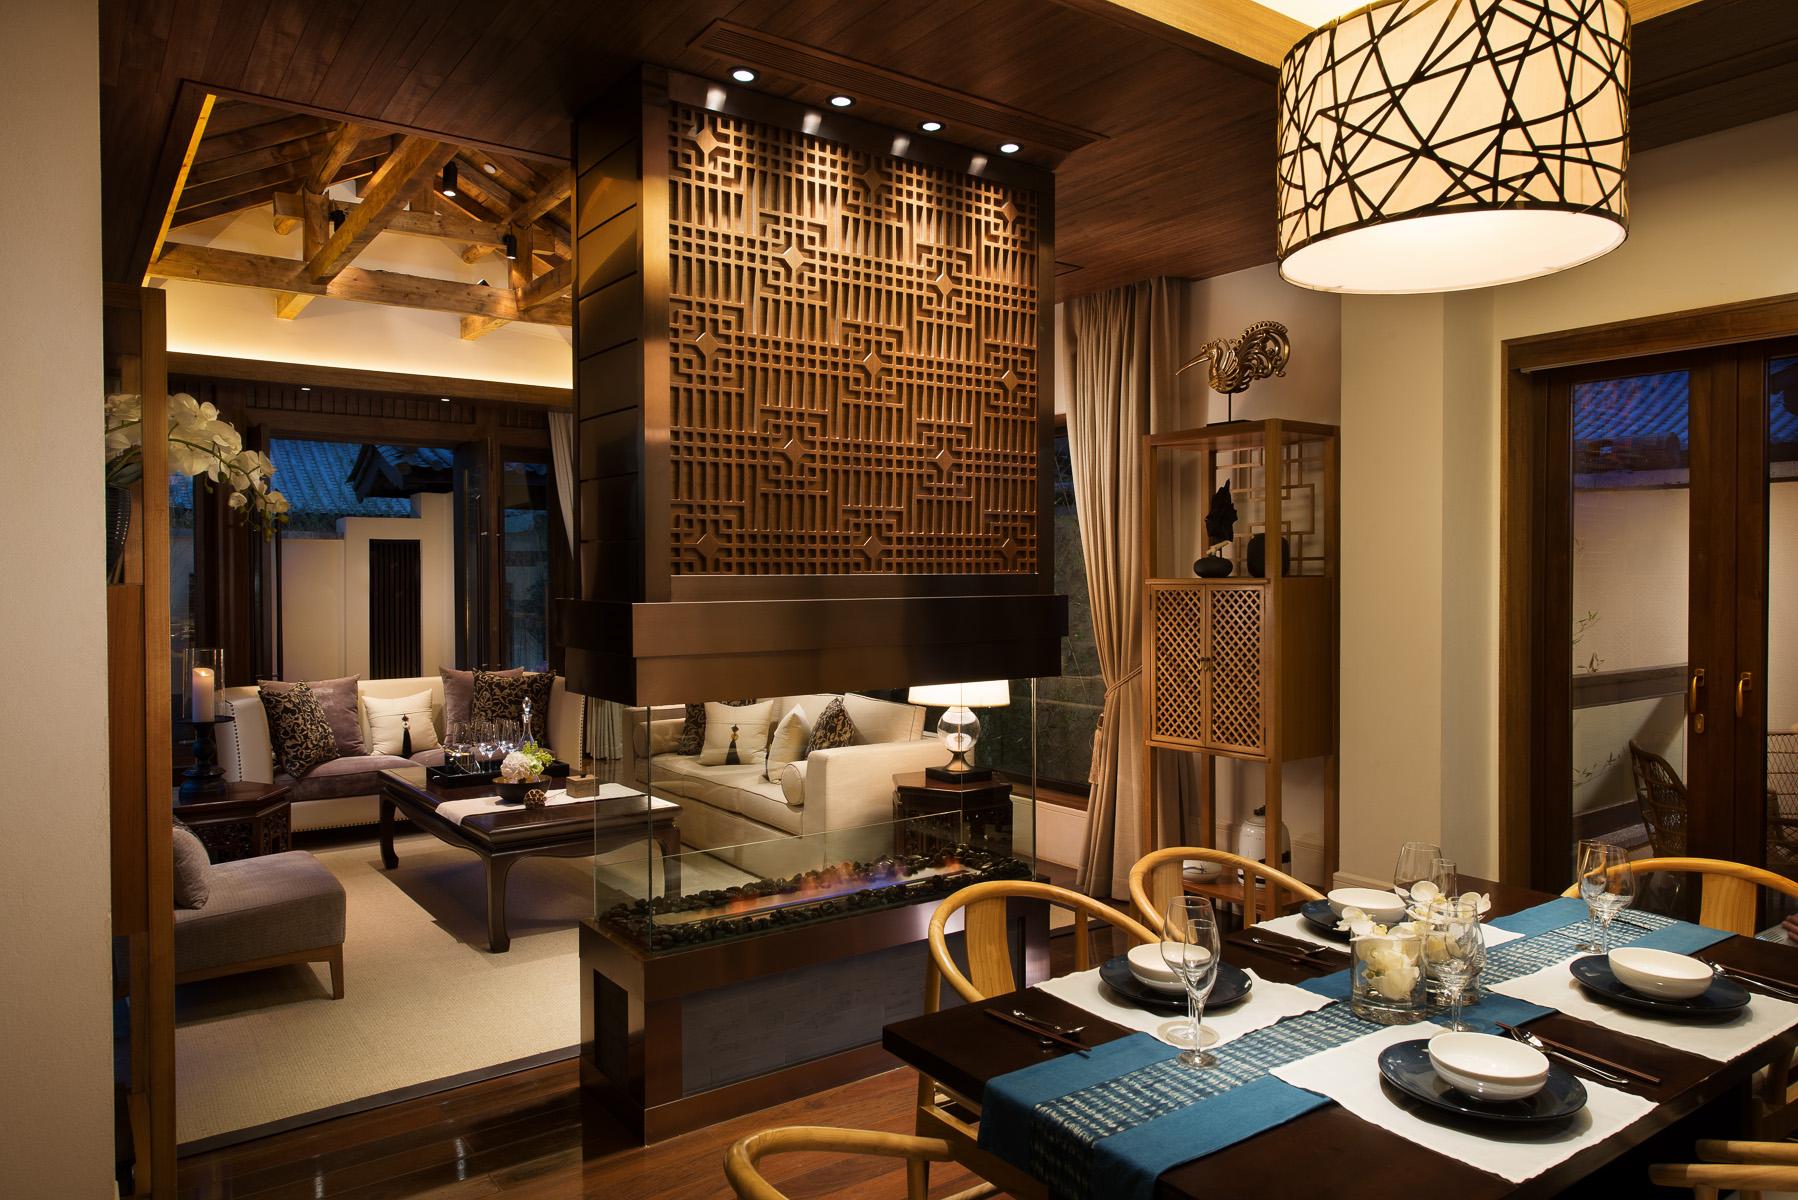 20140501_HBA_LiJiang-Villa_ShanQu_Kitchen-to-Livingroom_F2.jpg